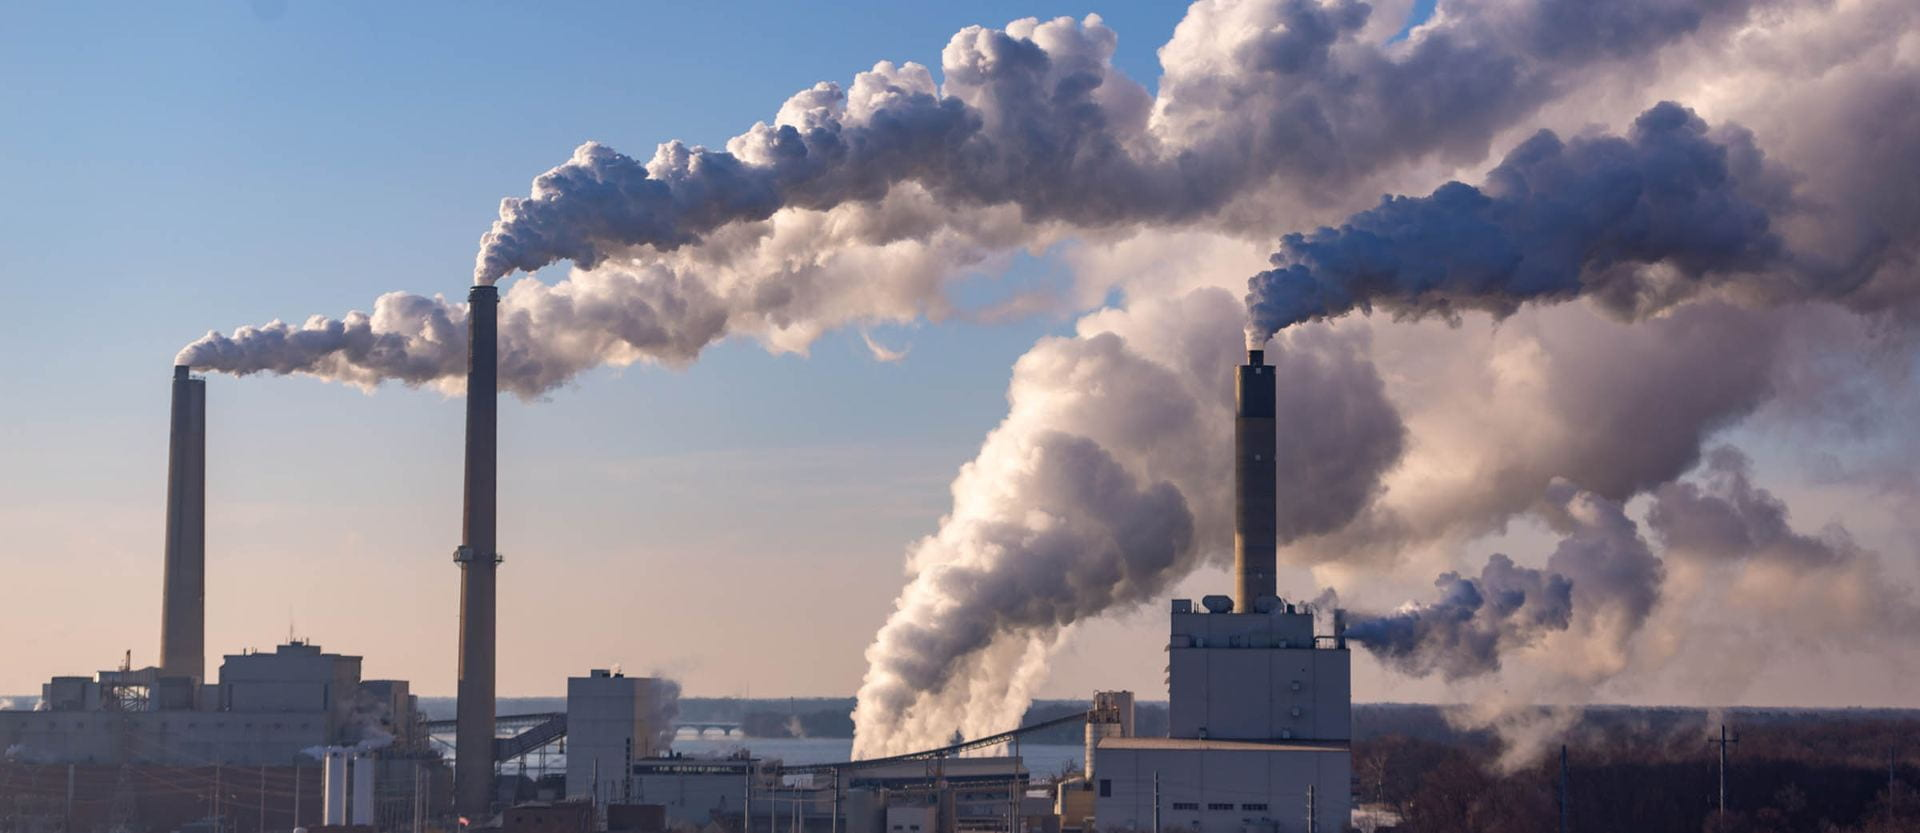 Emissions Disclosures